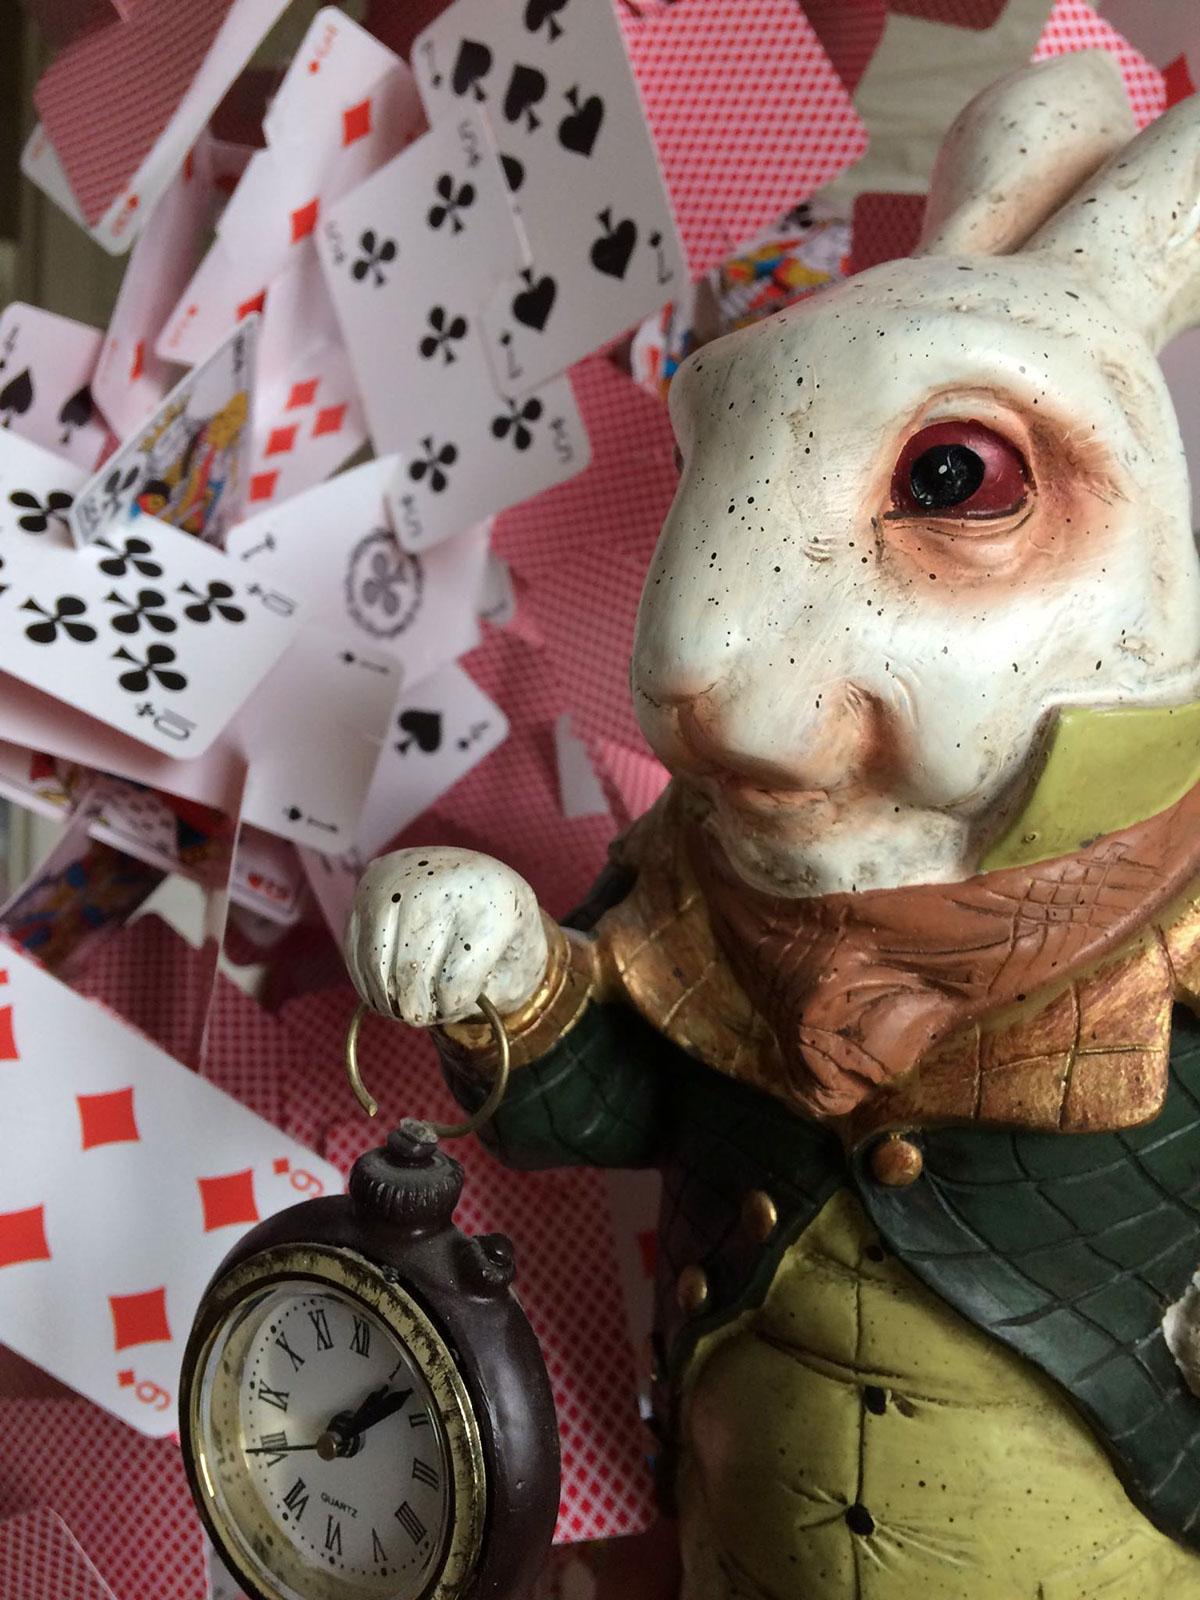 alice in wonderland lewis carroll alice through the looking glass Event Paris festival disney